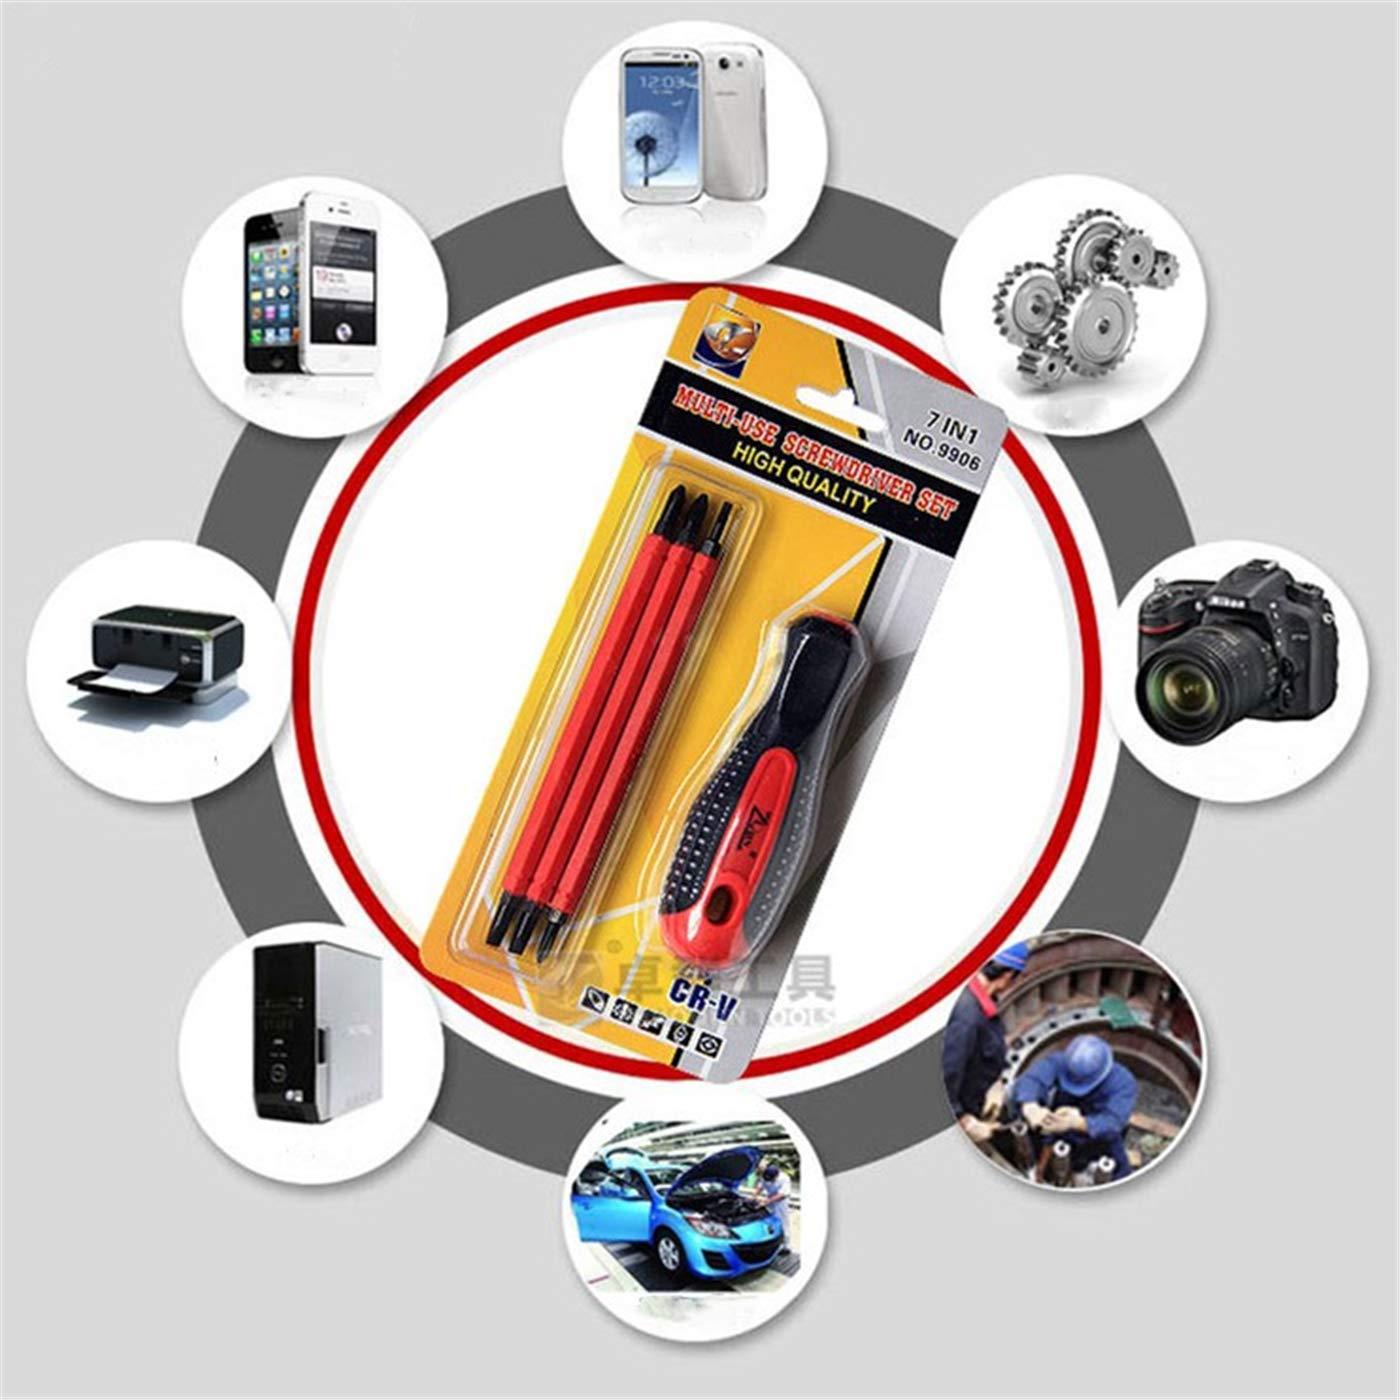 Sucastle Screwdriver Set Magnetic Electrician Precision 1000v Voltage Repair Screwdriver Screwdriver Set Insulated Screwdriver Bits 1 Set